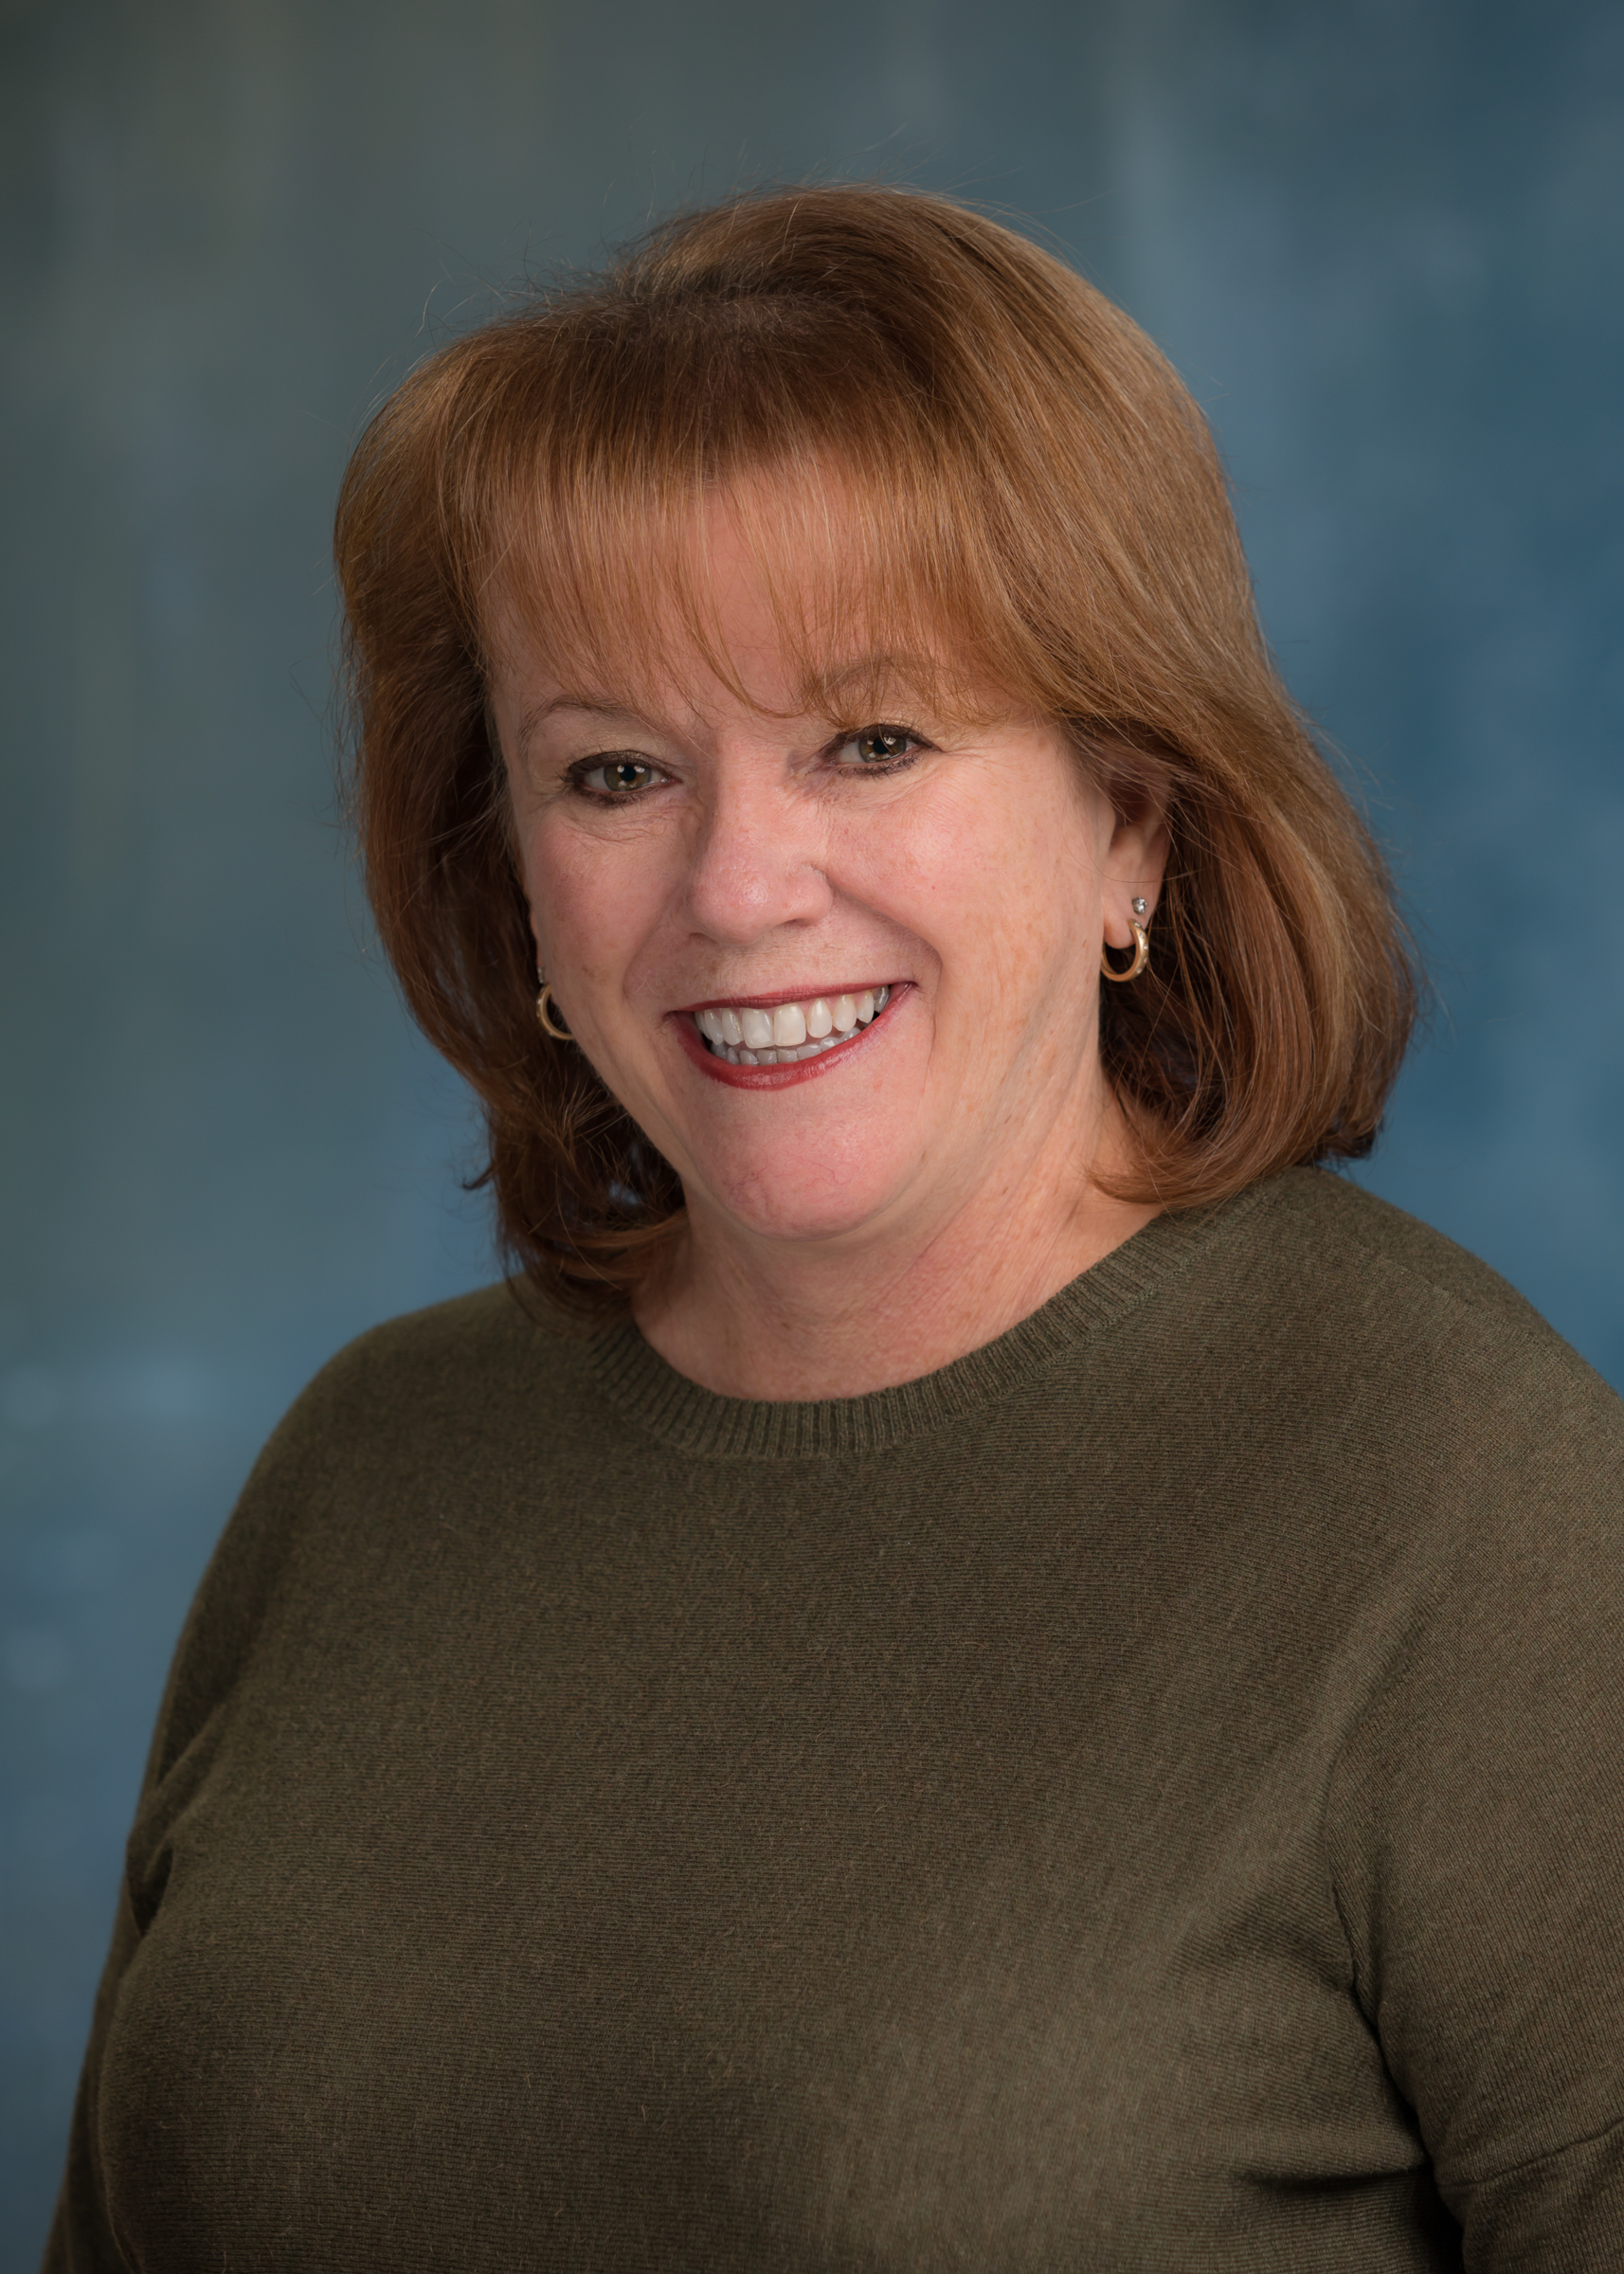 Pam Siekman - Chairperson, Haywood Street Fresco